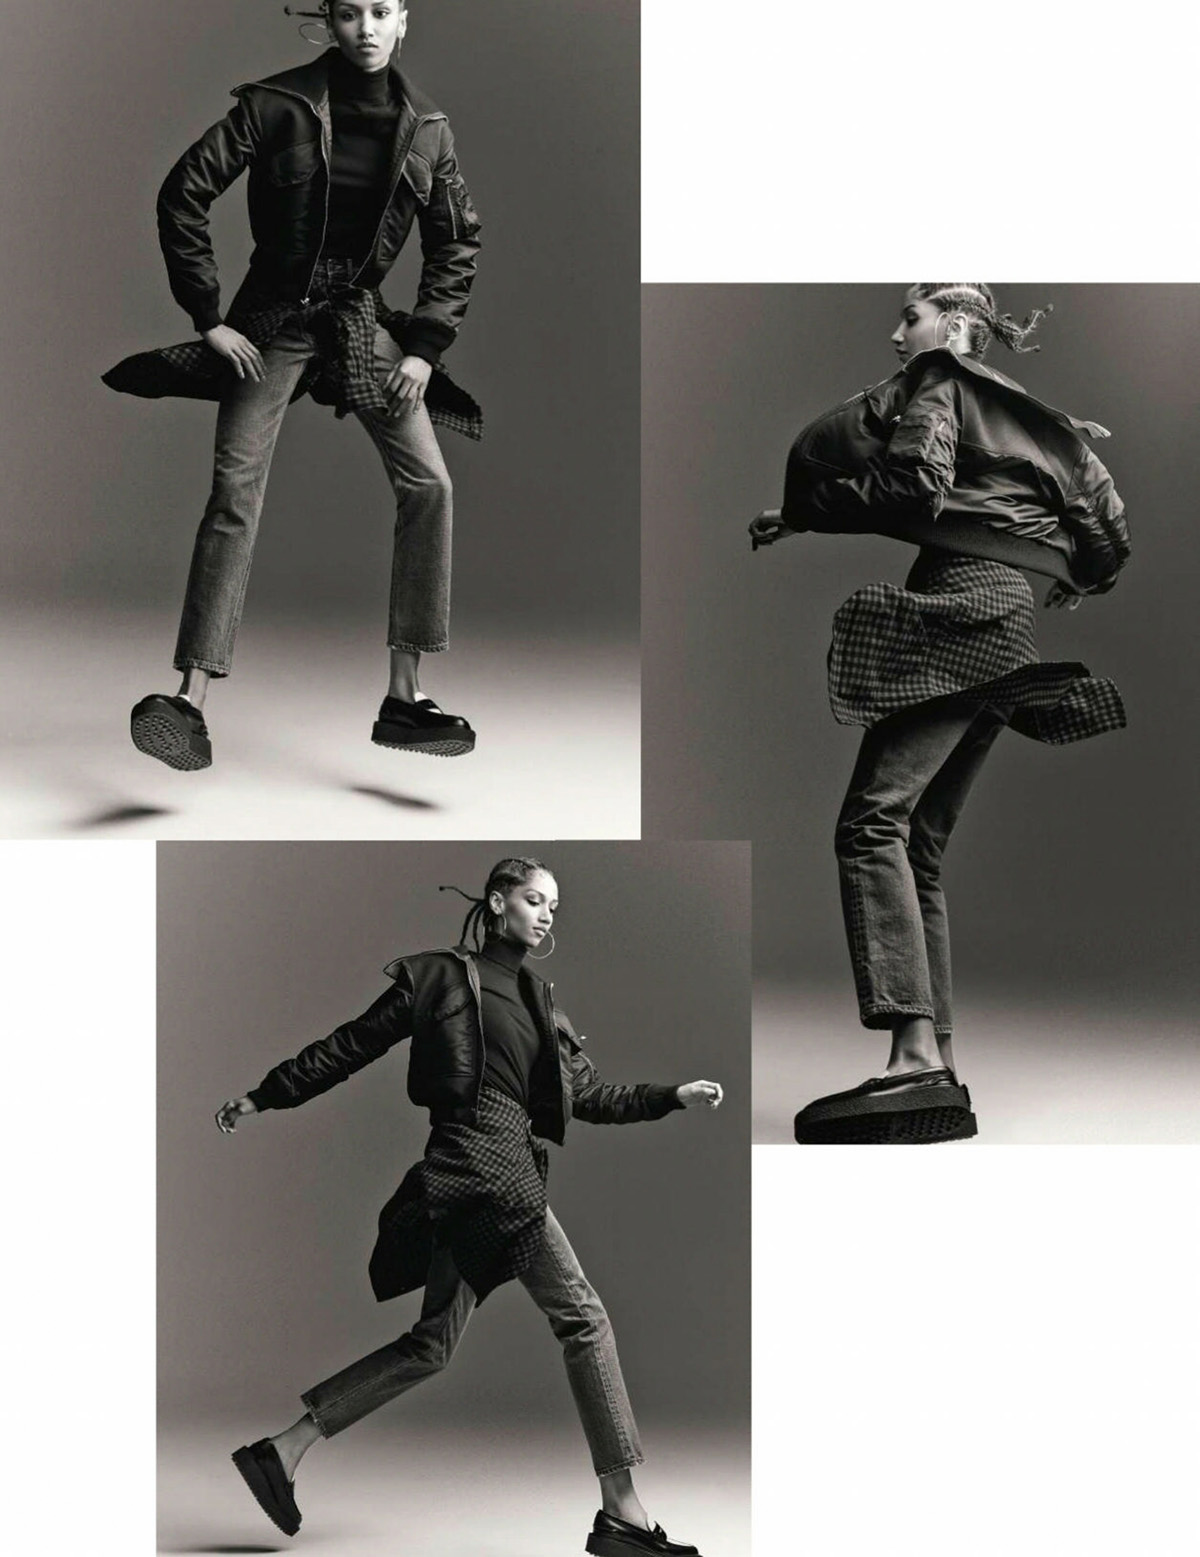 Aiden Curtiss by Tom Schirmacher for Elle France September 24th, 2021